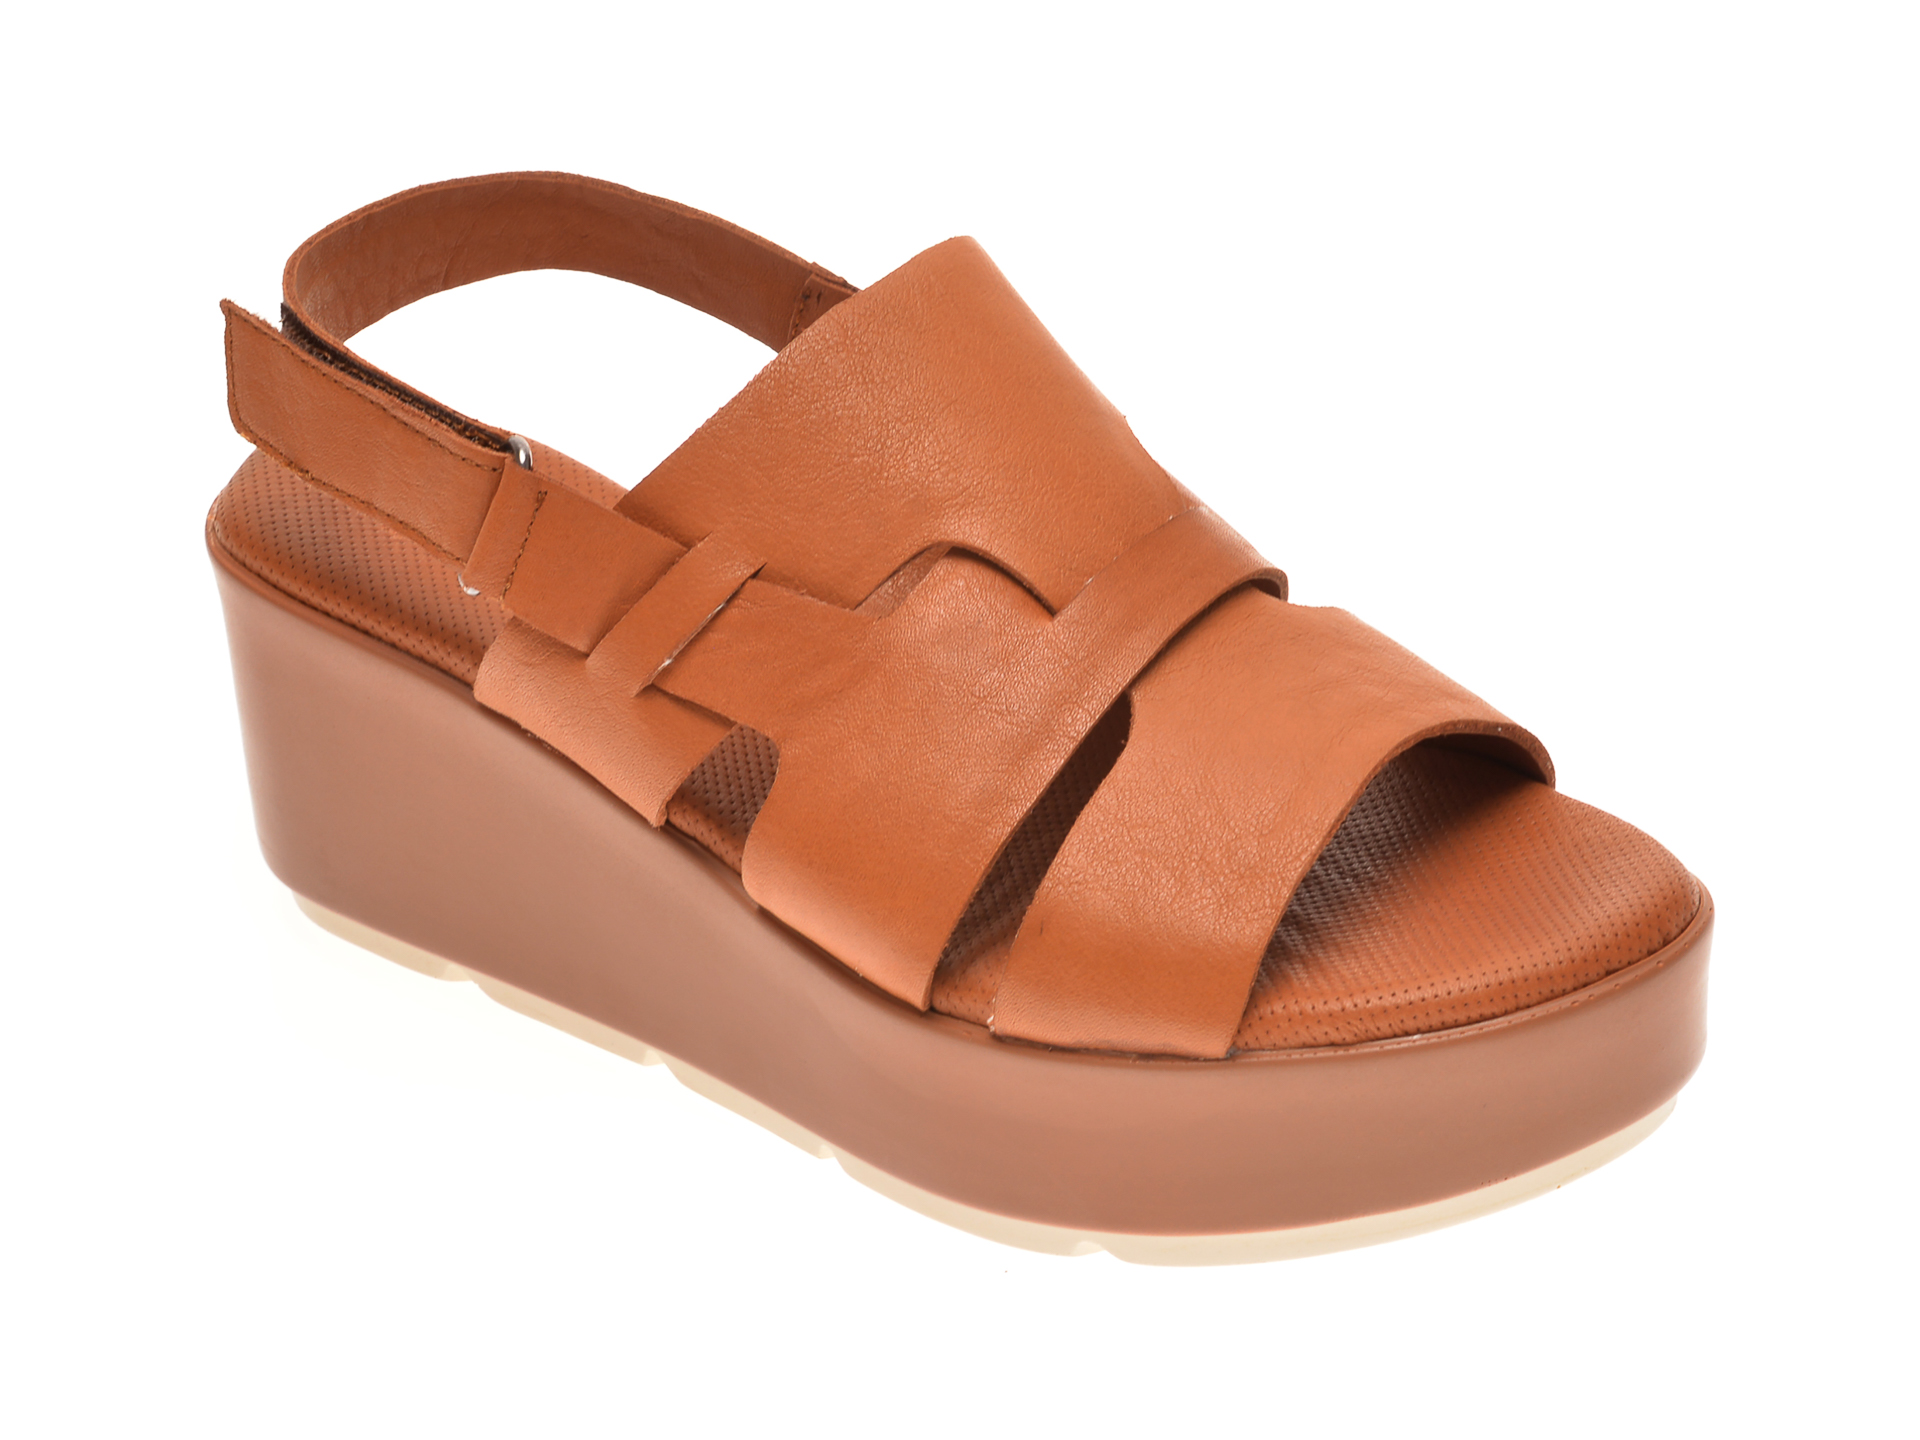 Sandale BABOOS maro, 2519, din piele naturala imagine